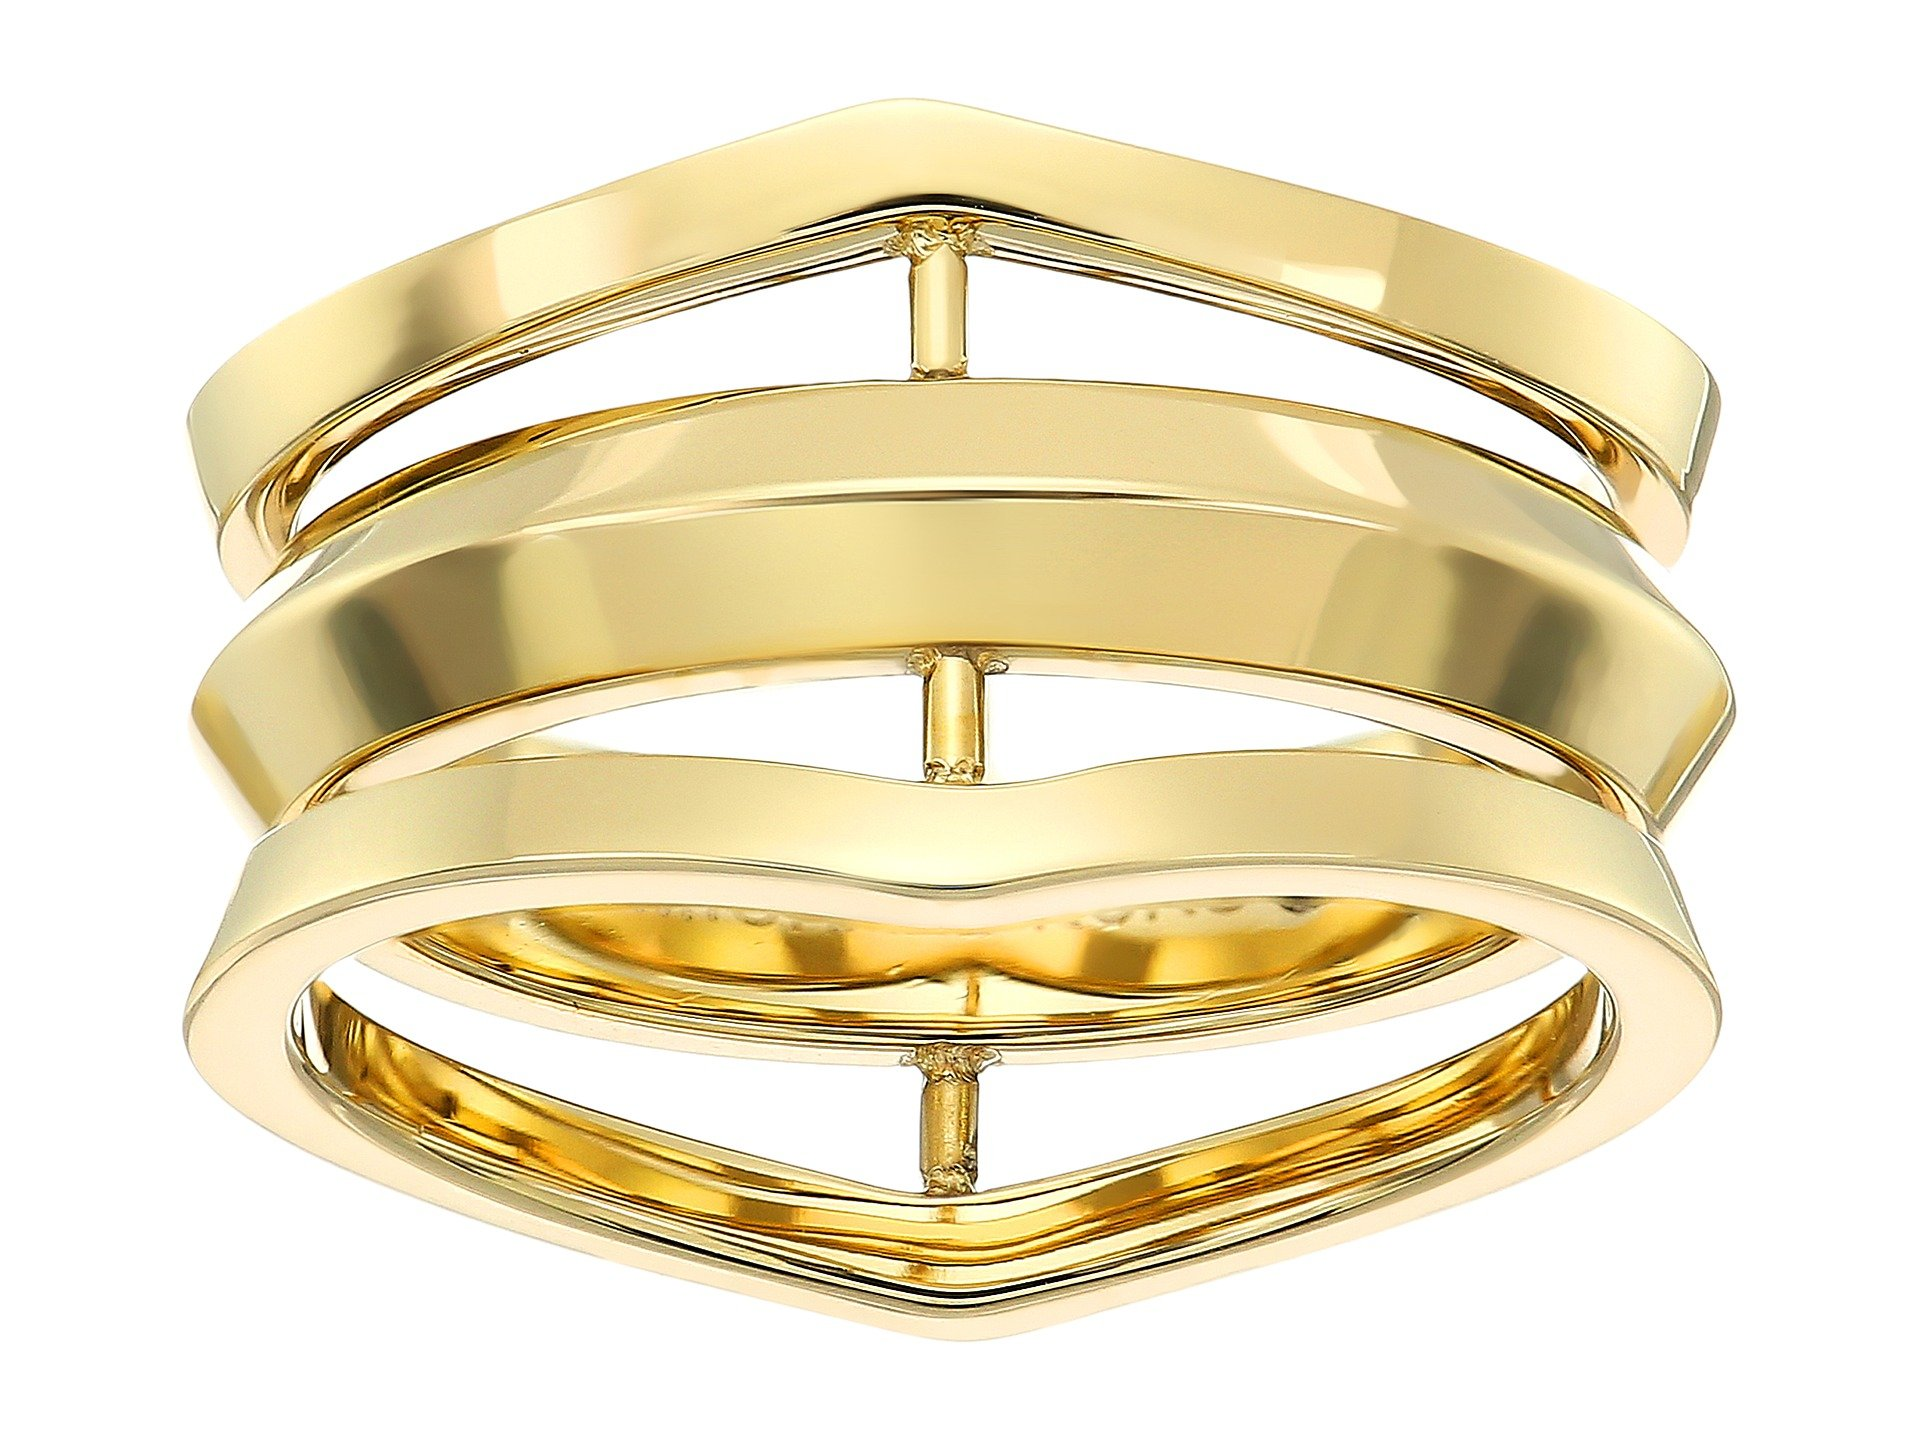 Anillo para Mujer Michael Kors Tone Open Ring  + Michael Kors en VeoyCompro.net